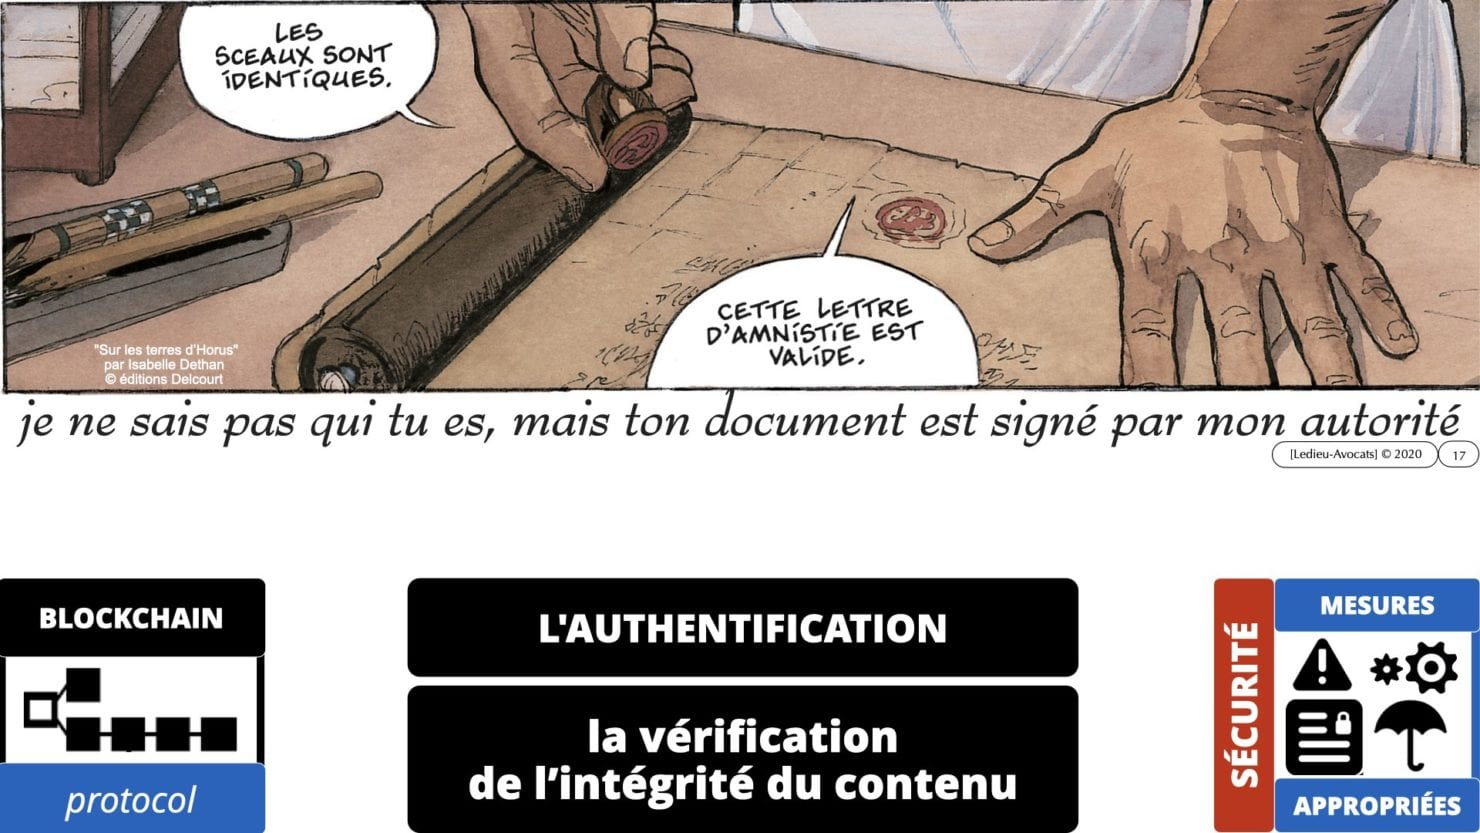 339 référentiel ANSSI PVID podcast NoLimitSecu #326 du 28 juin 2021 © Ledieu-Avocats.017